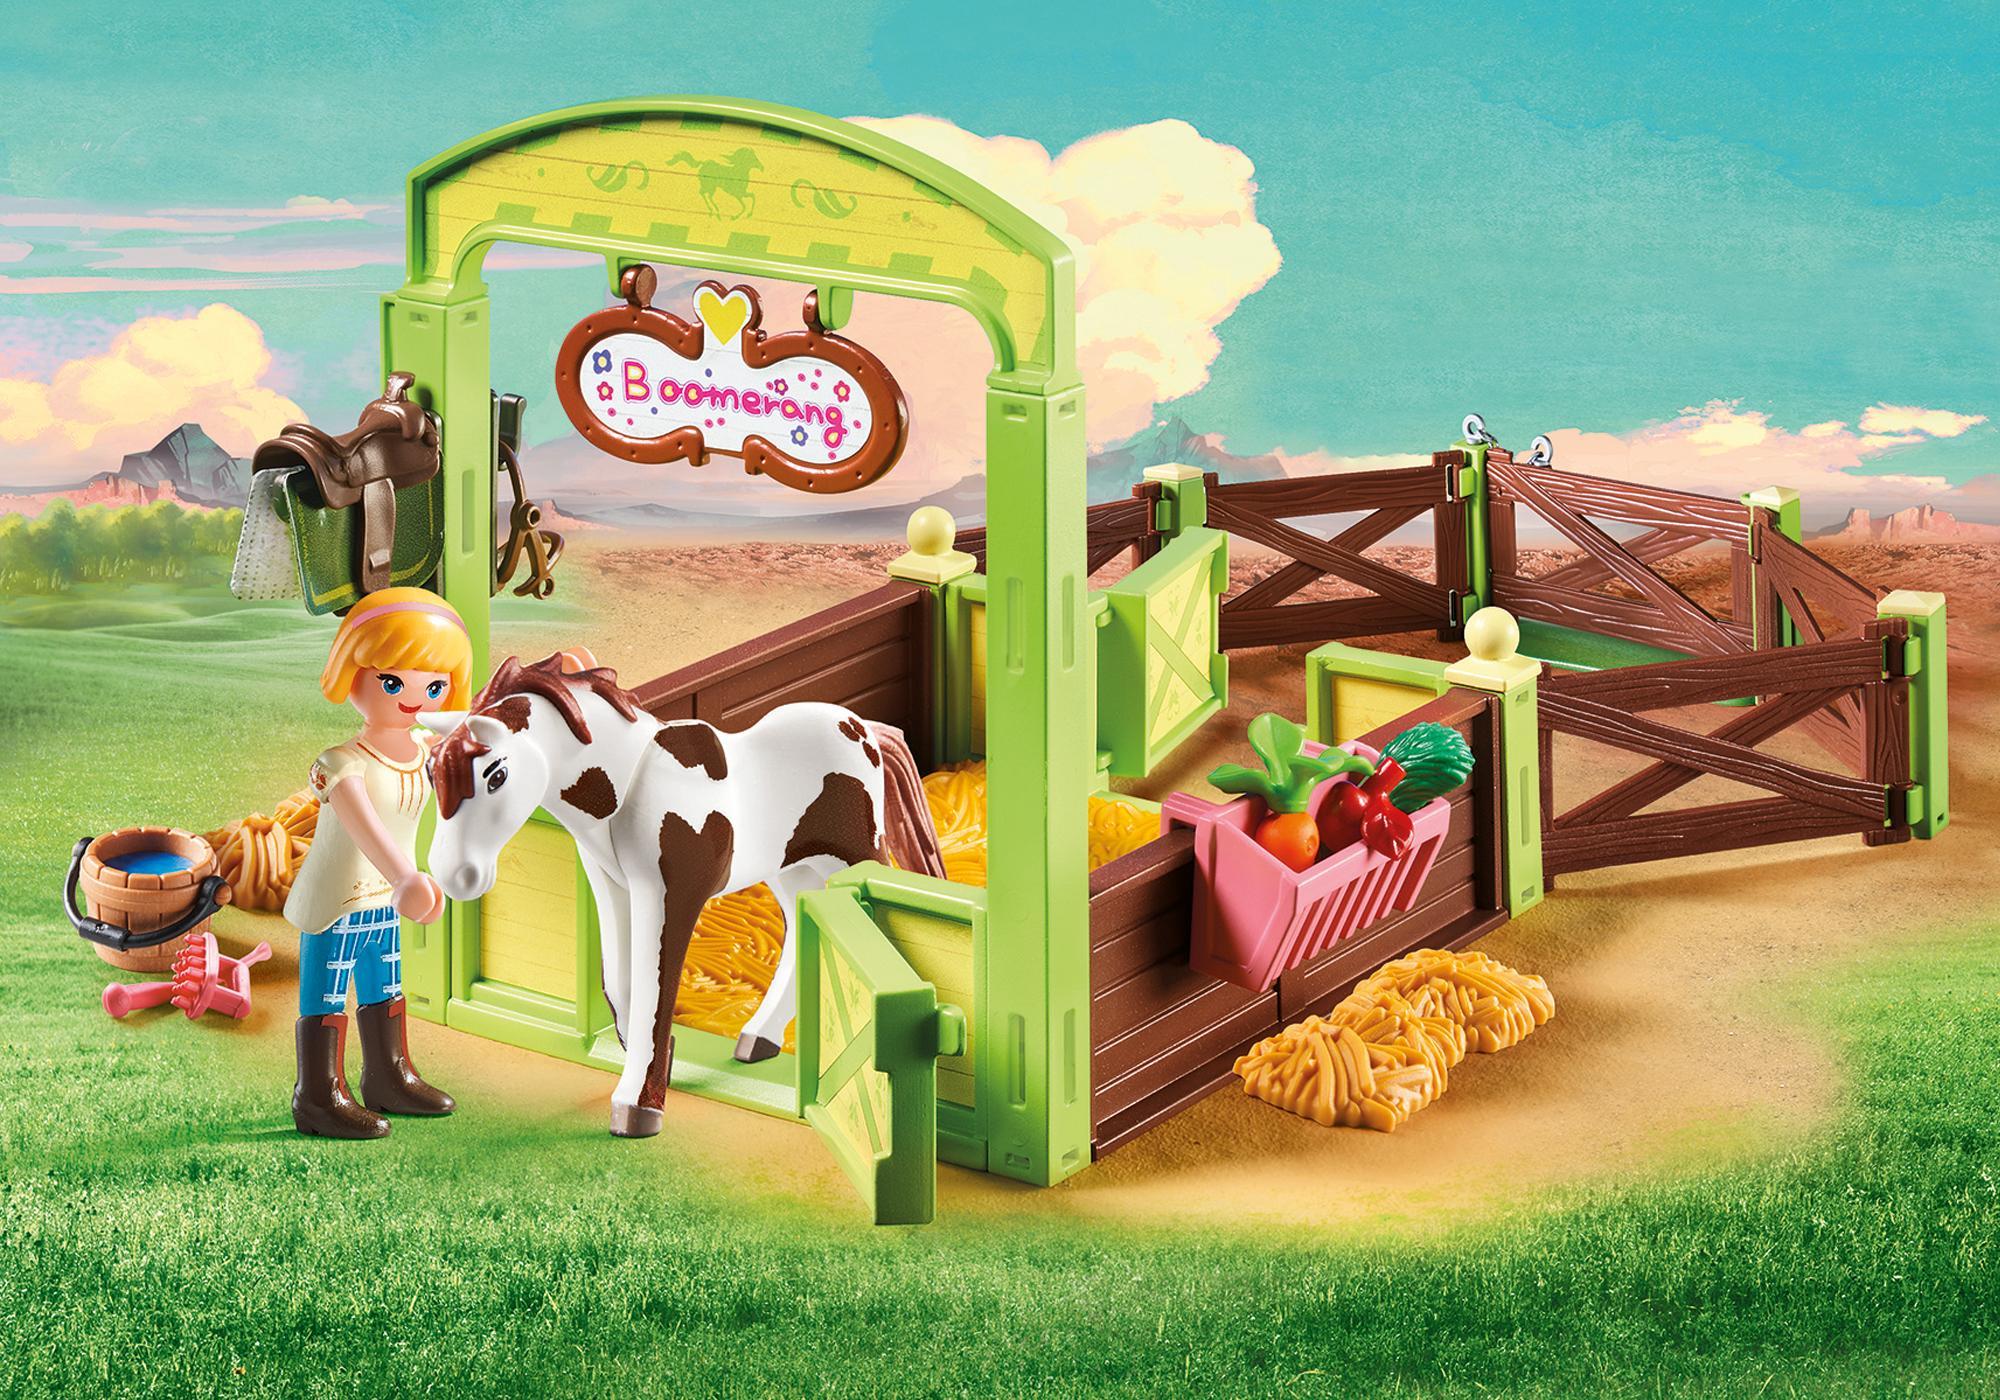 9480_product_detail/Abigail & Boomerang met paardenbox